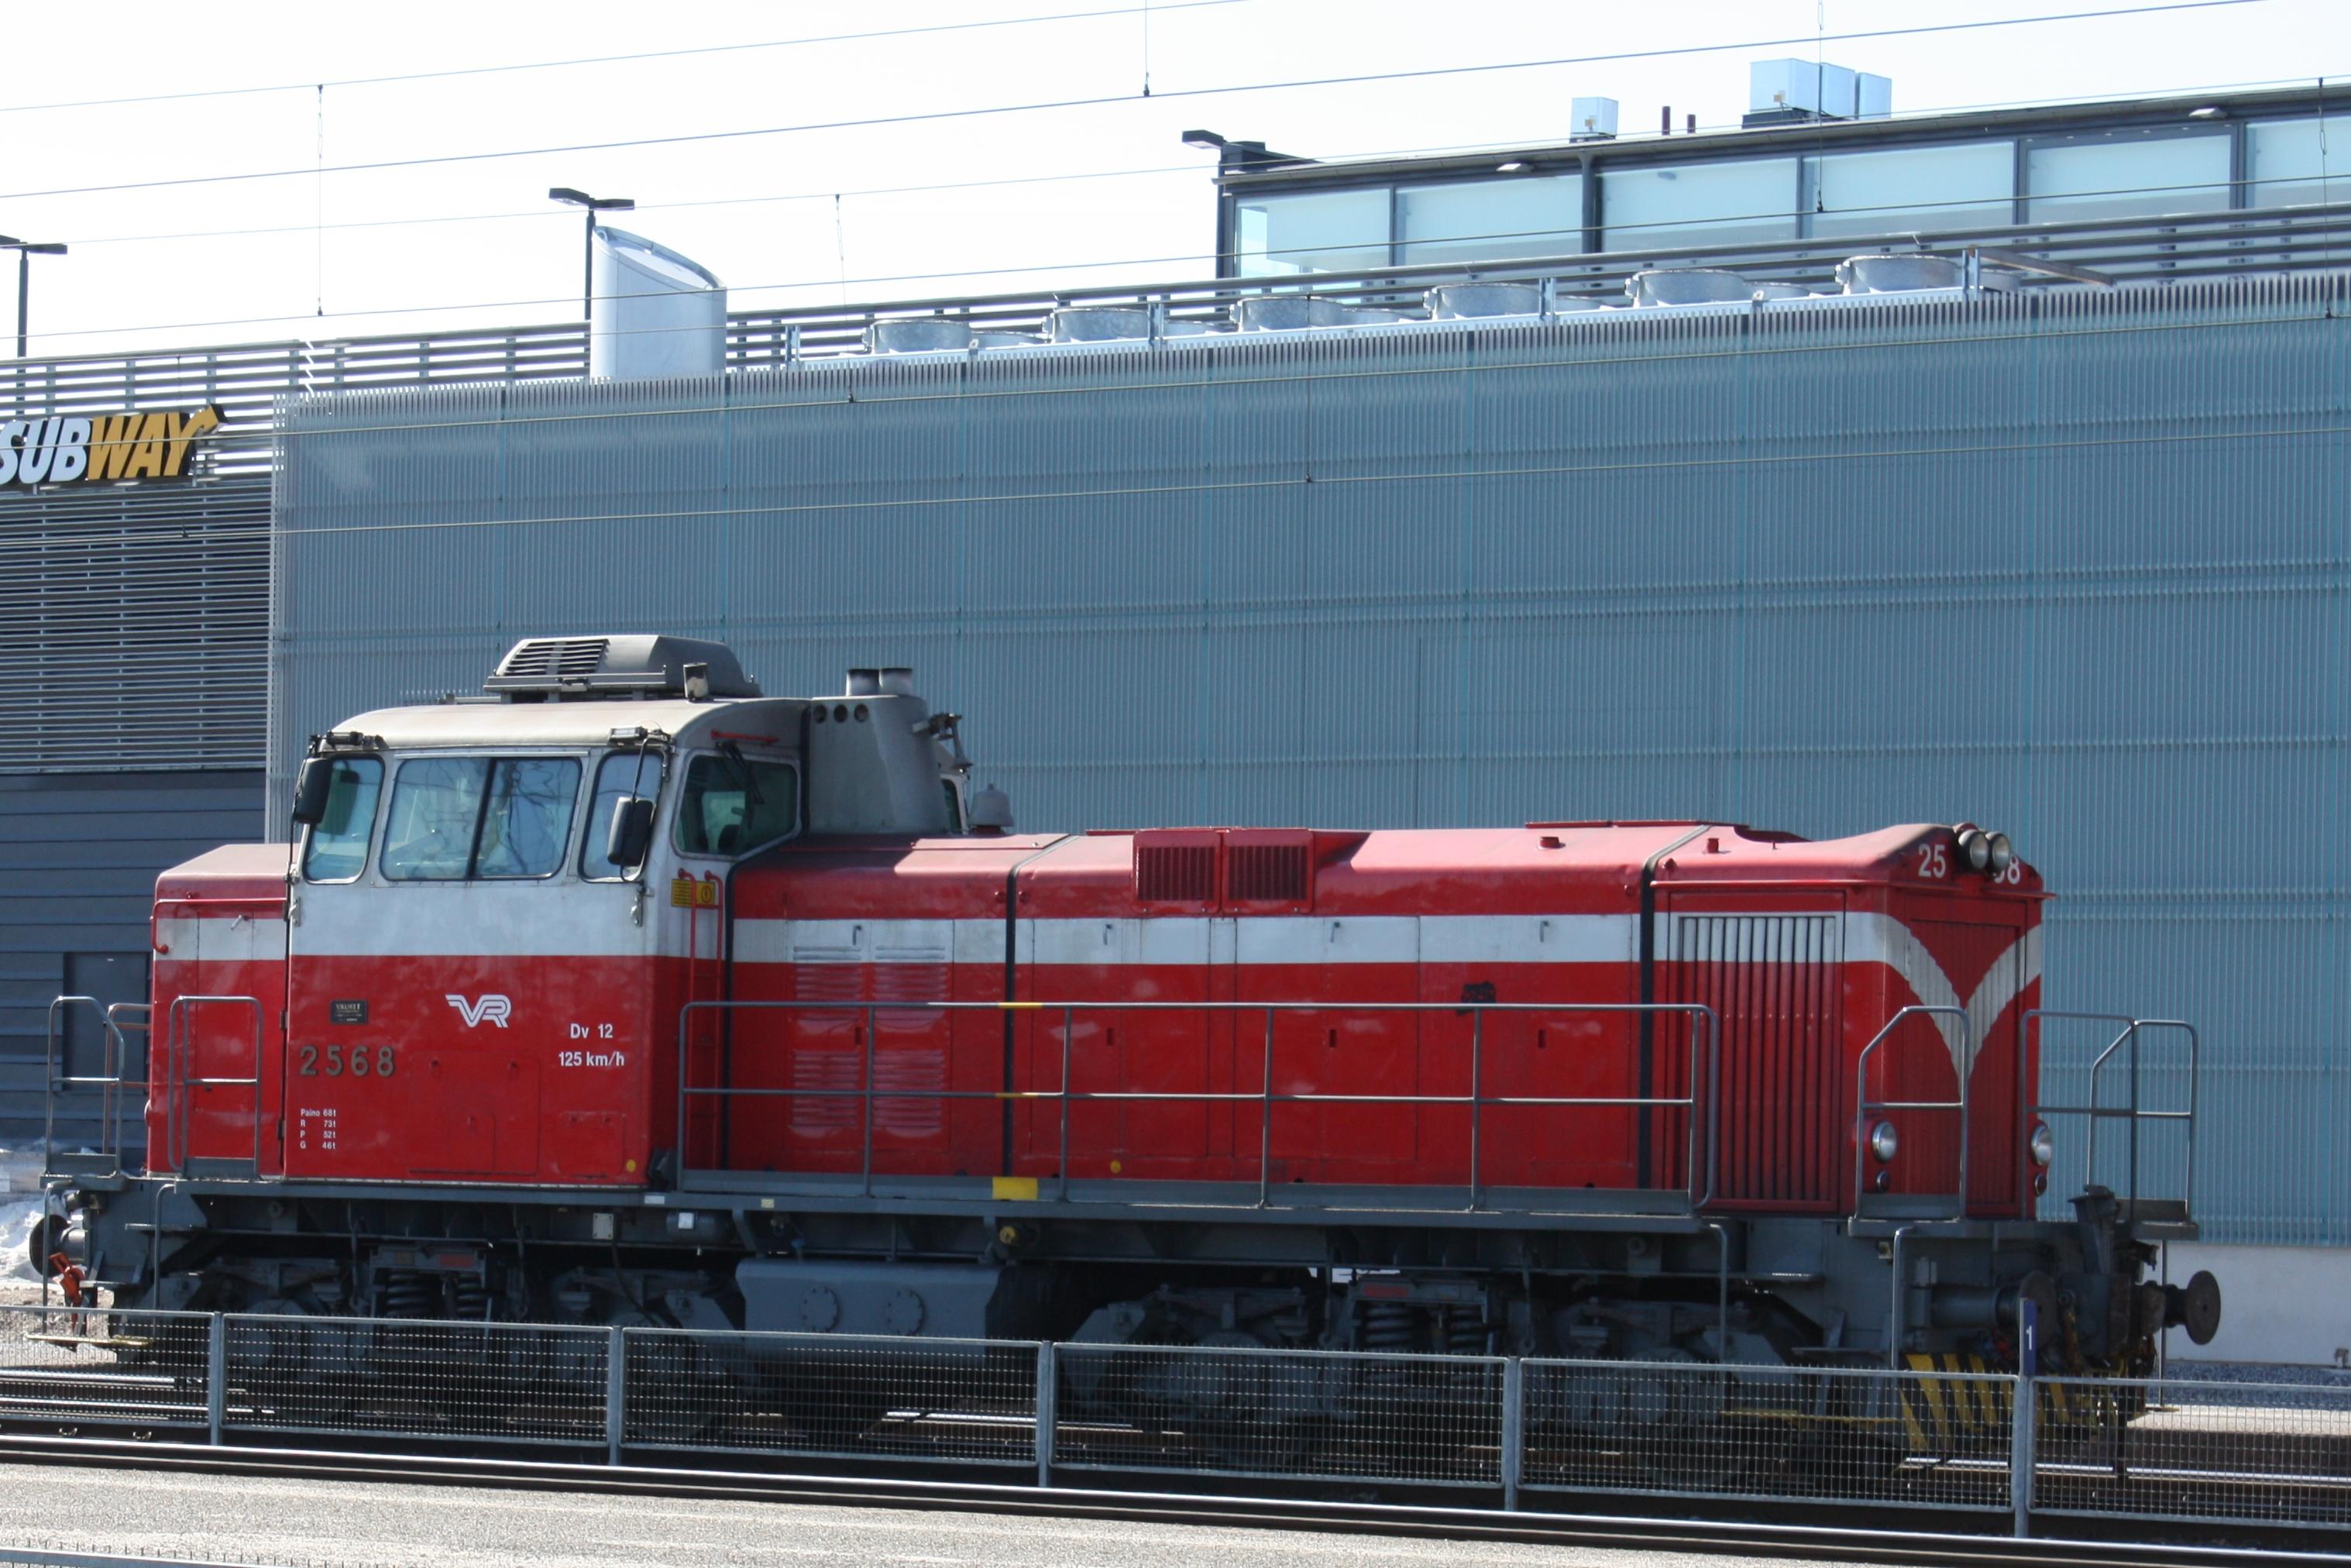 File:Dieselveturi Dv 12 2568 IM6212 C.JPG